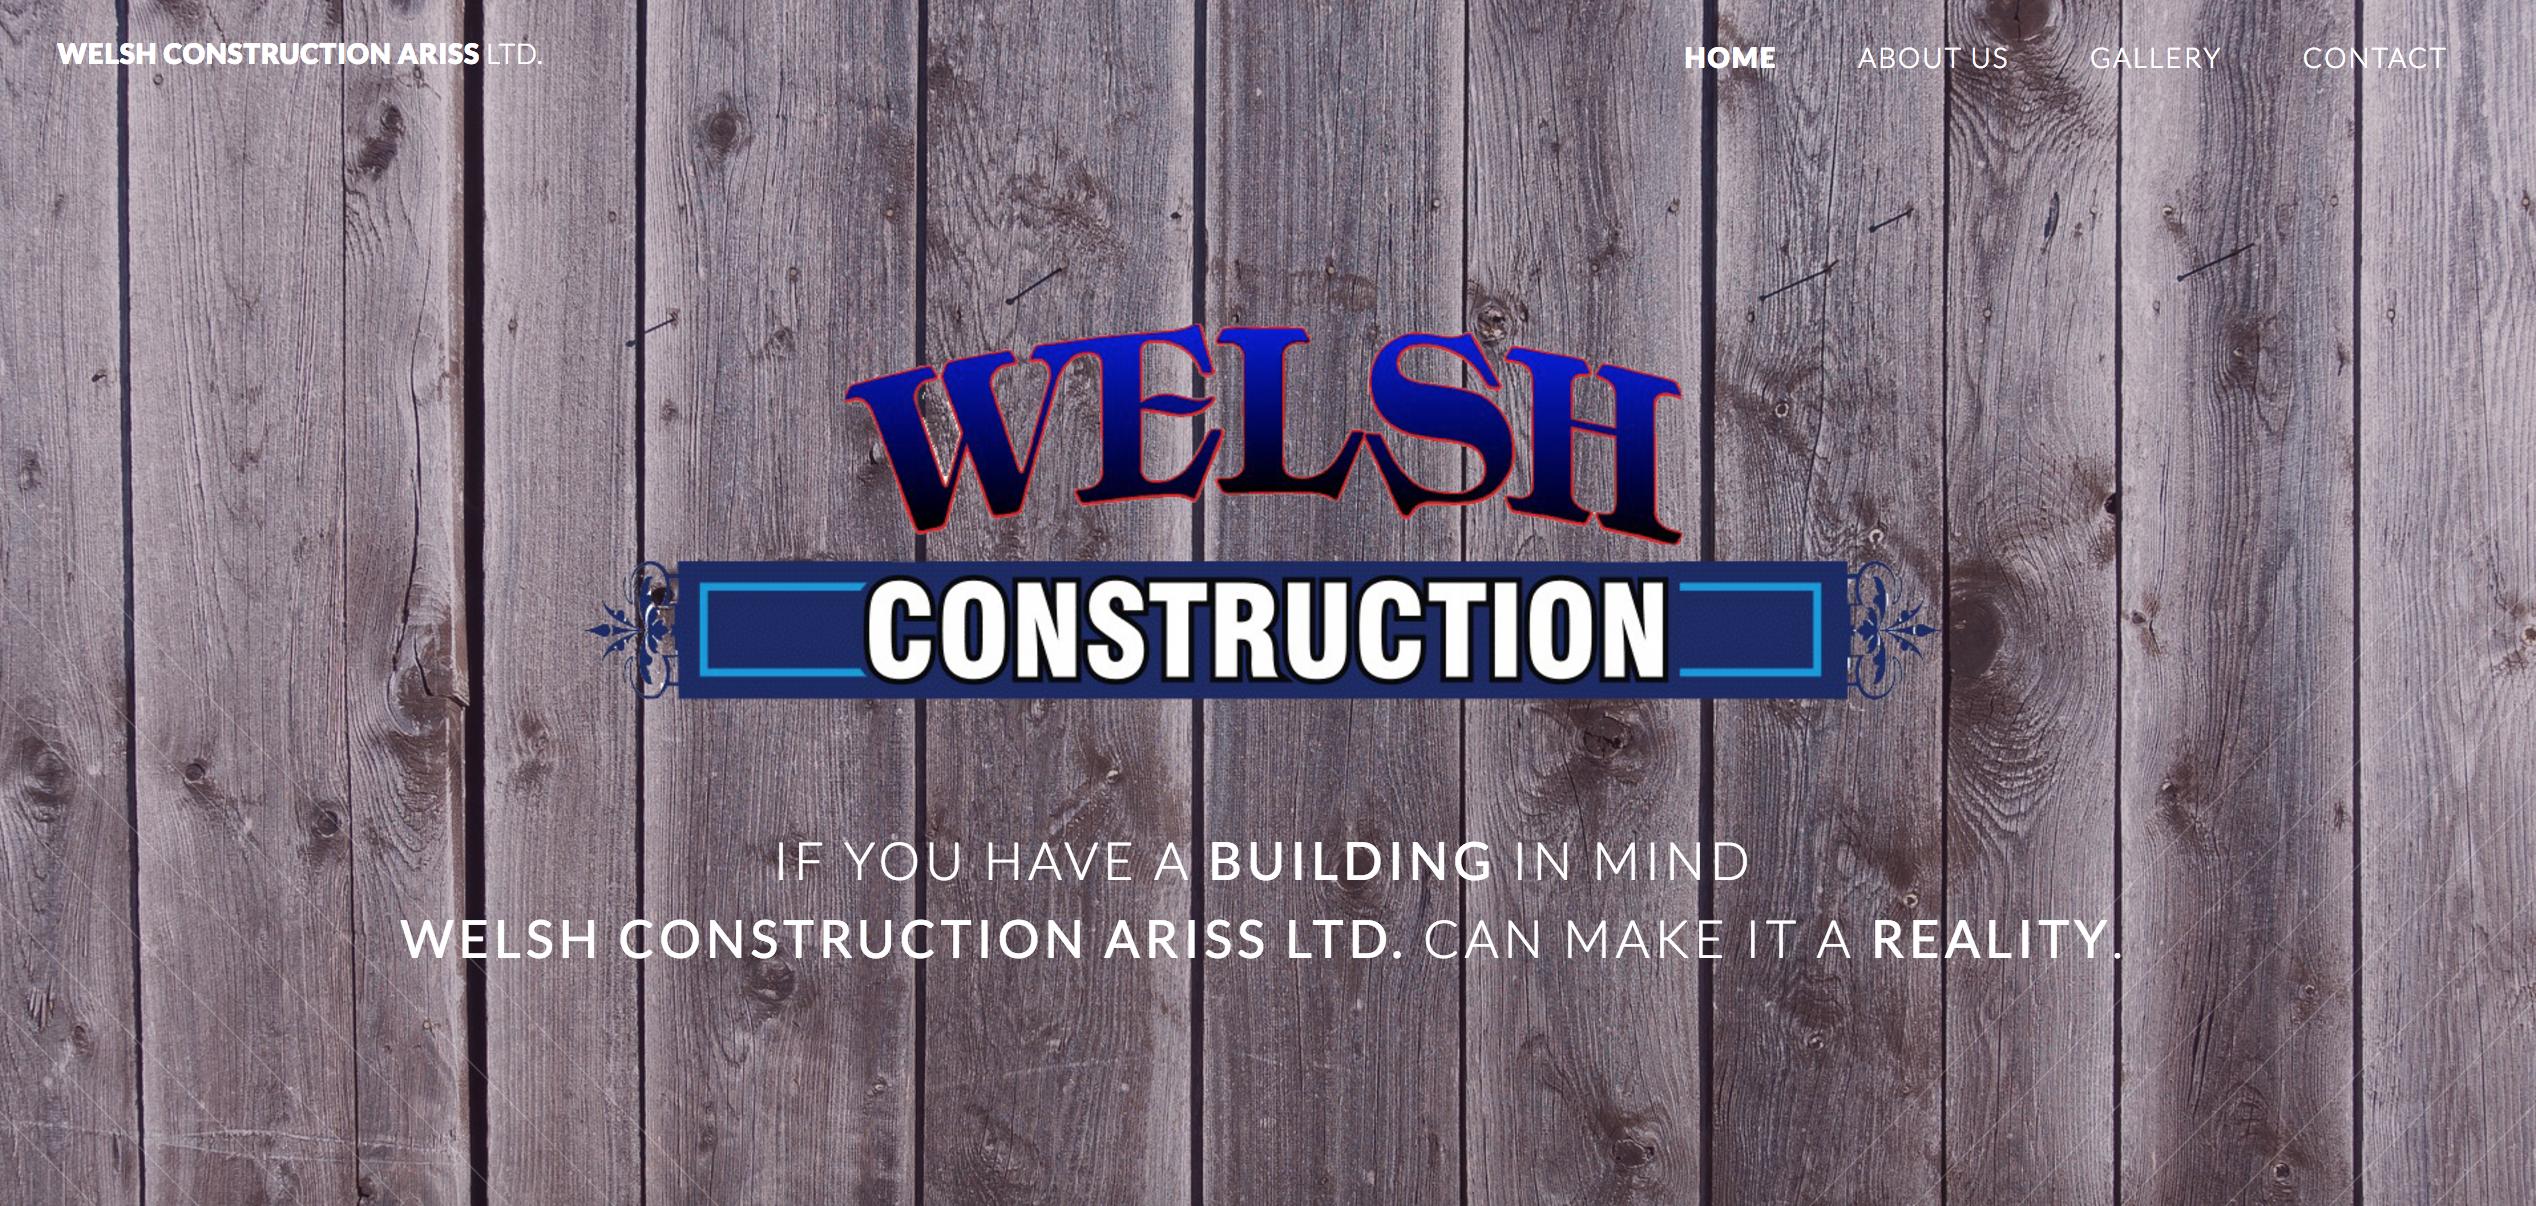 welshconstruction